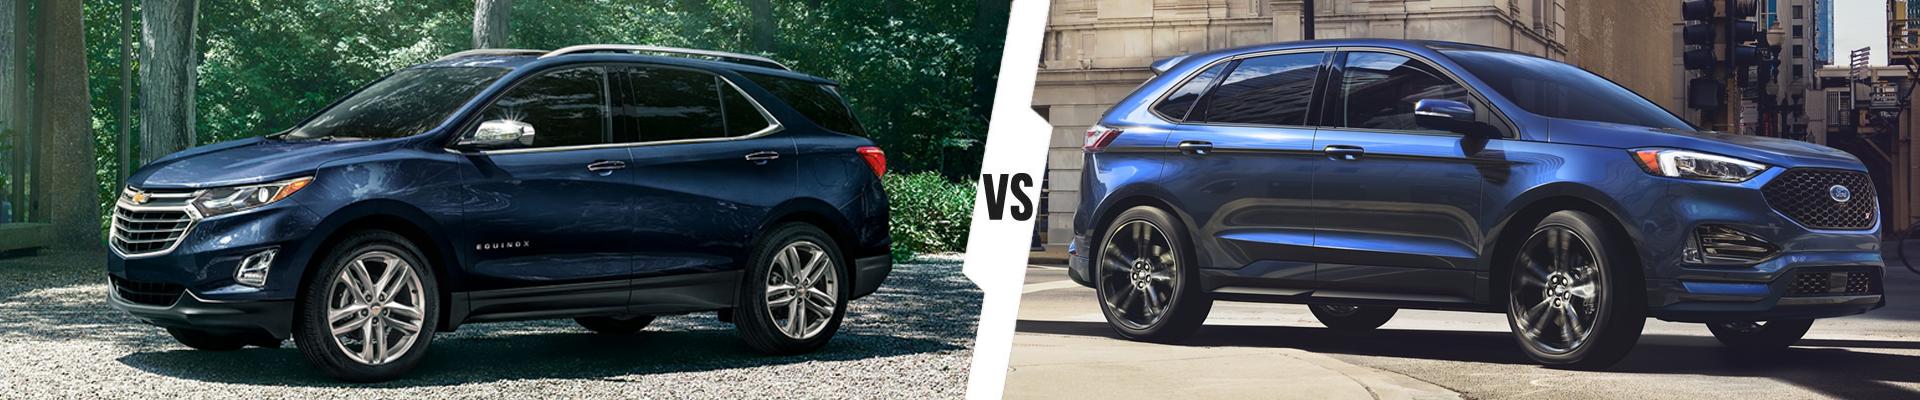 Crossover SUV Comparison: 2021 Chevrolet Equinox Versus 2020 Ford Edge